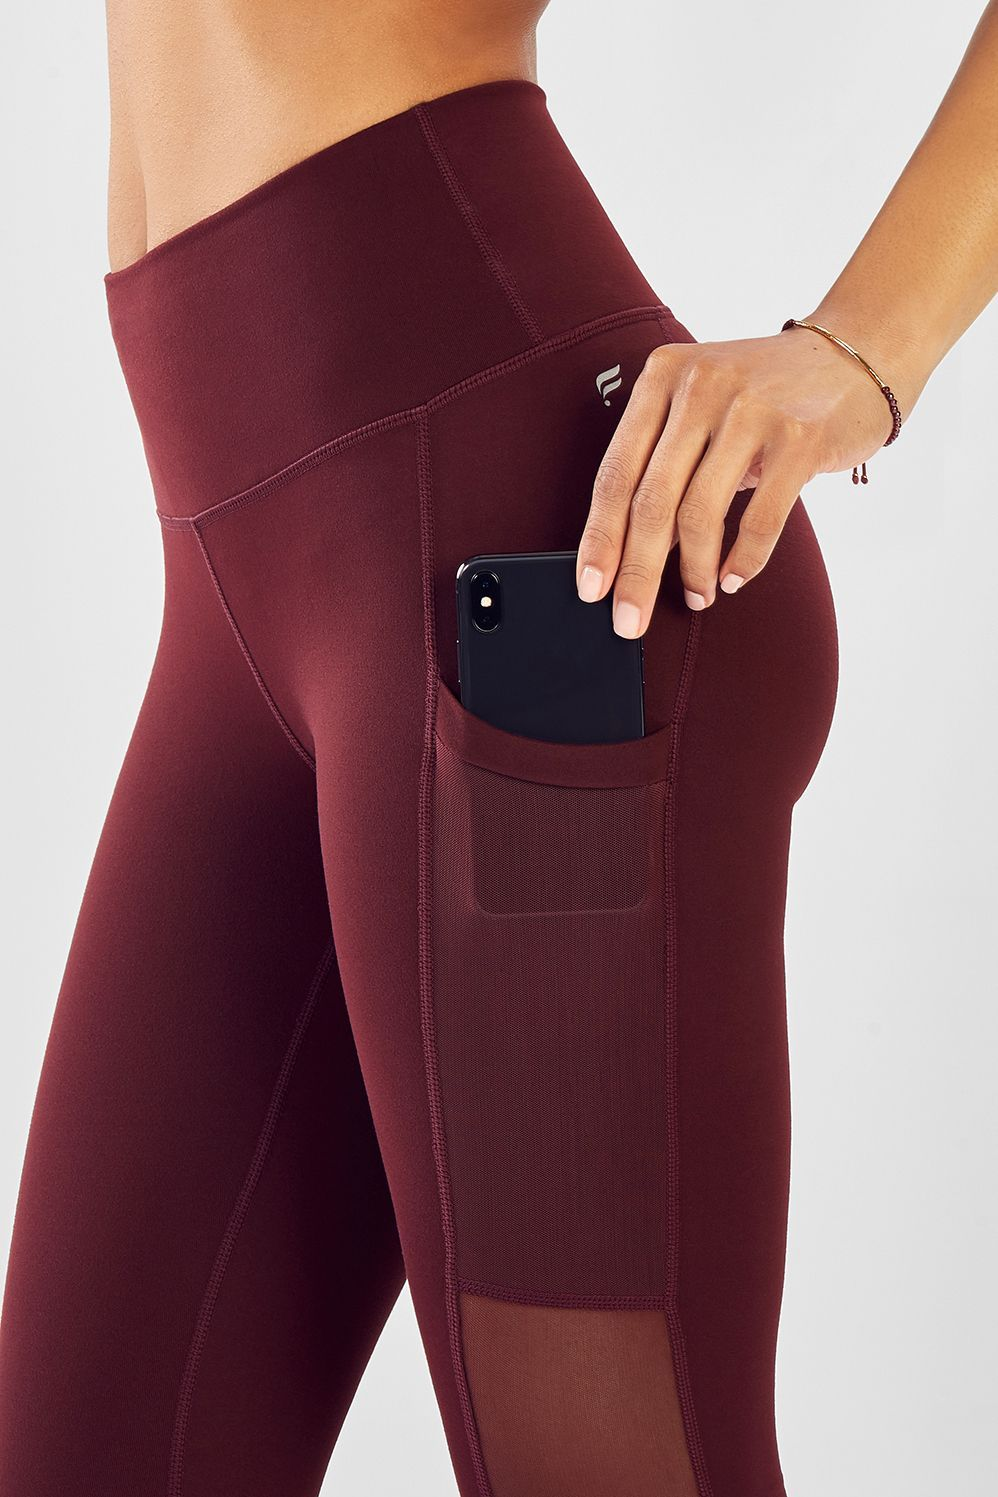 25bc7dc99217dc Mila Pocket Legging | Outfit | Burgundy leggings, Mesh fabric, Pocket